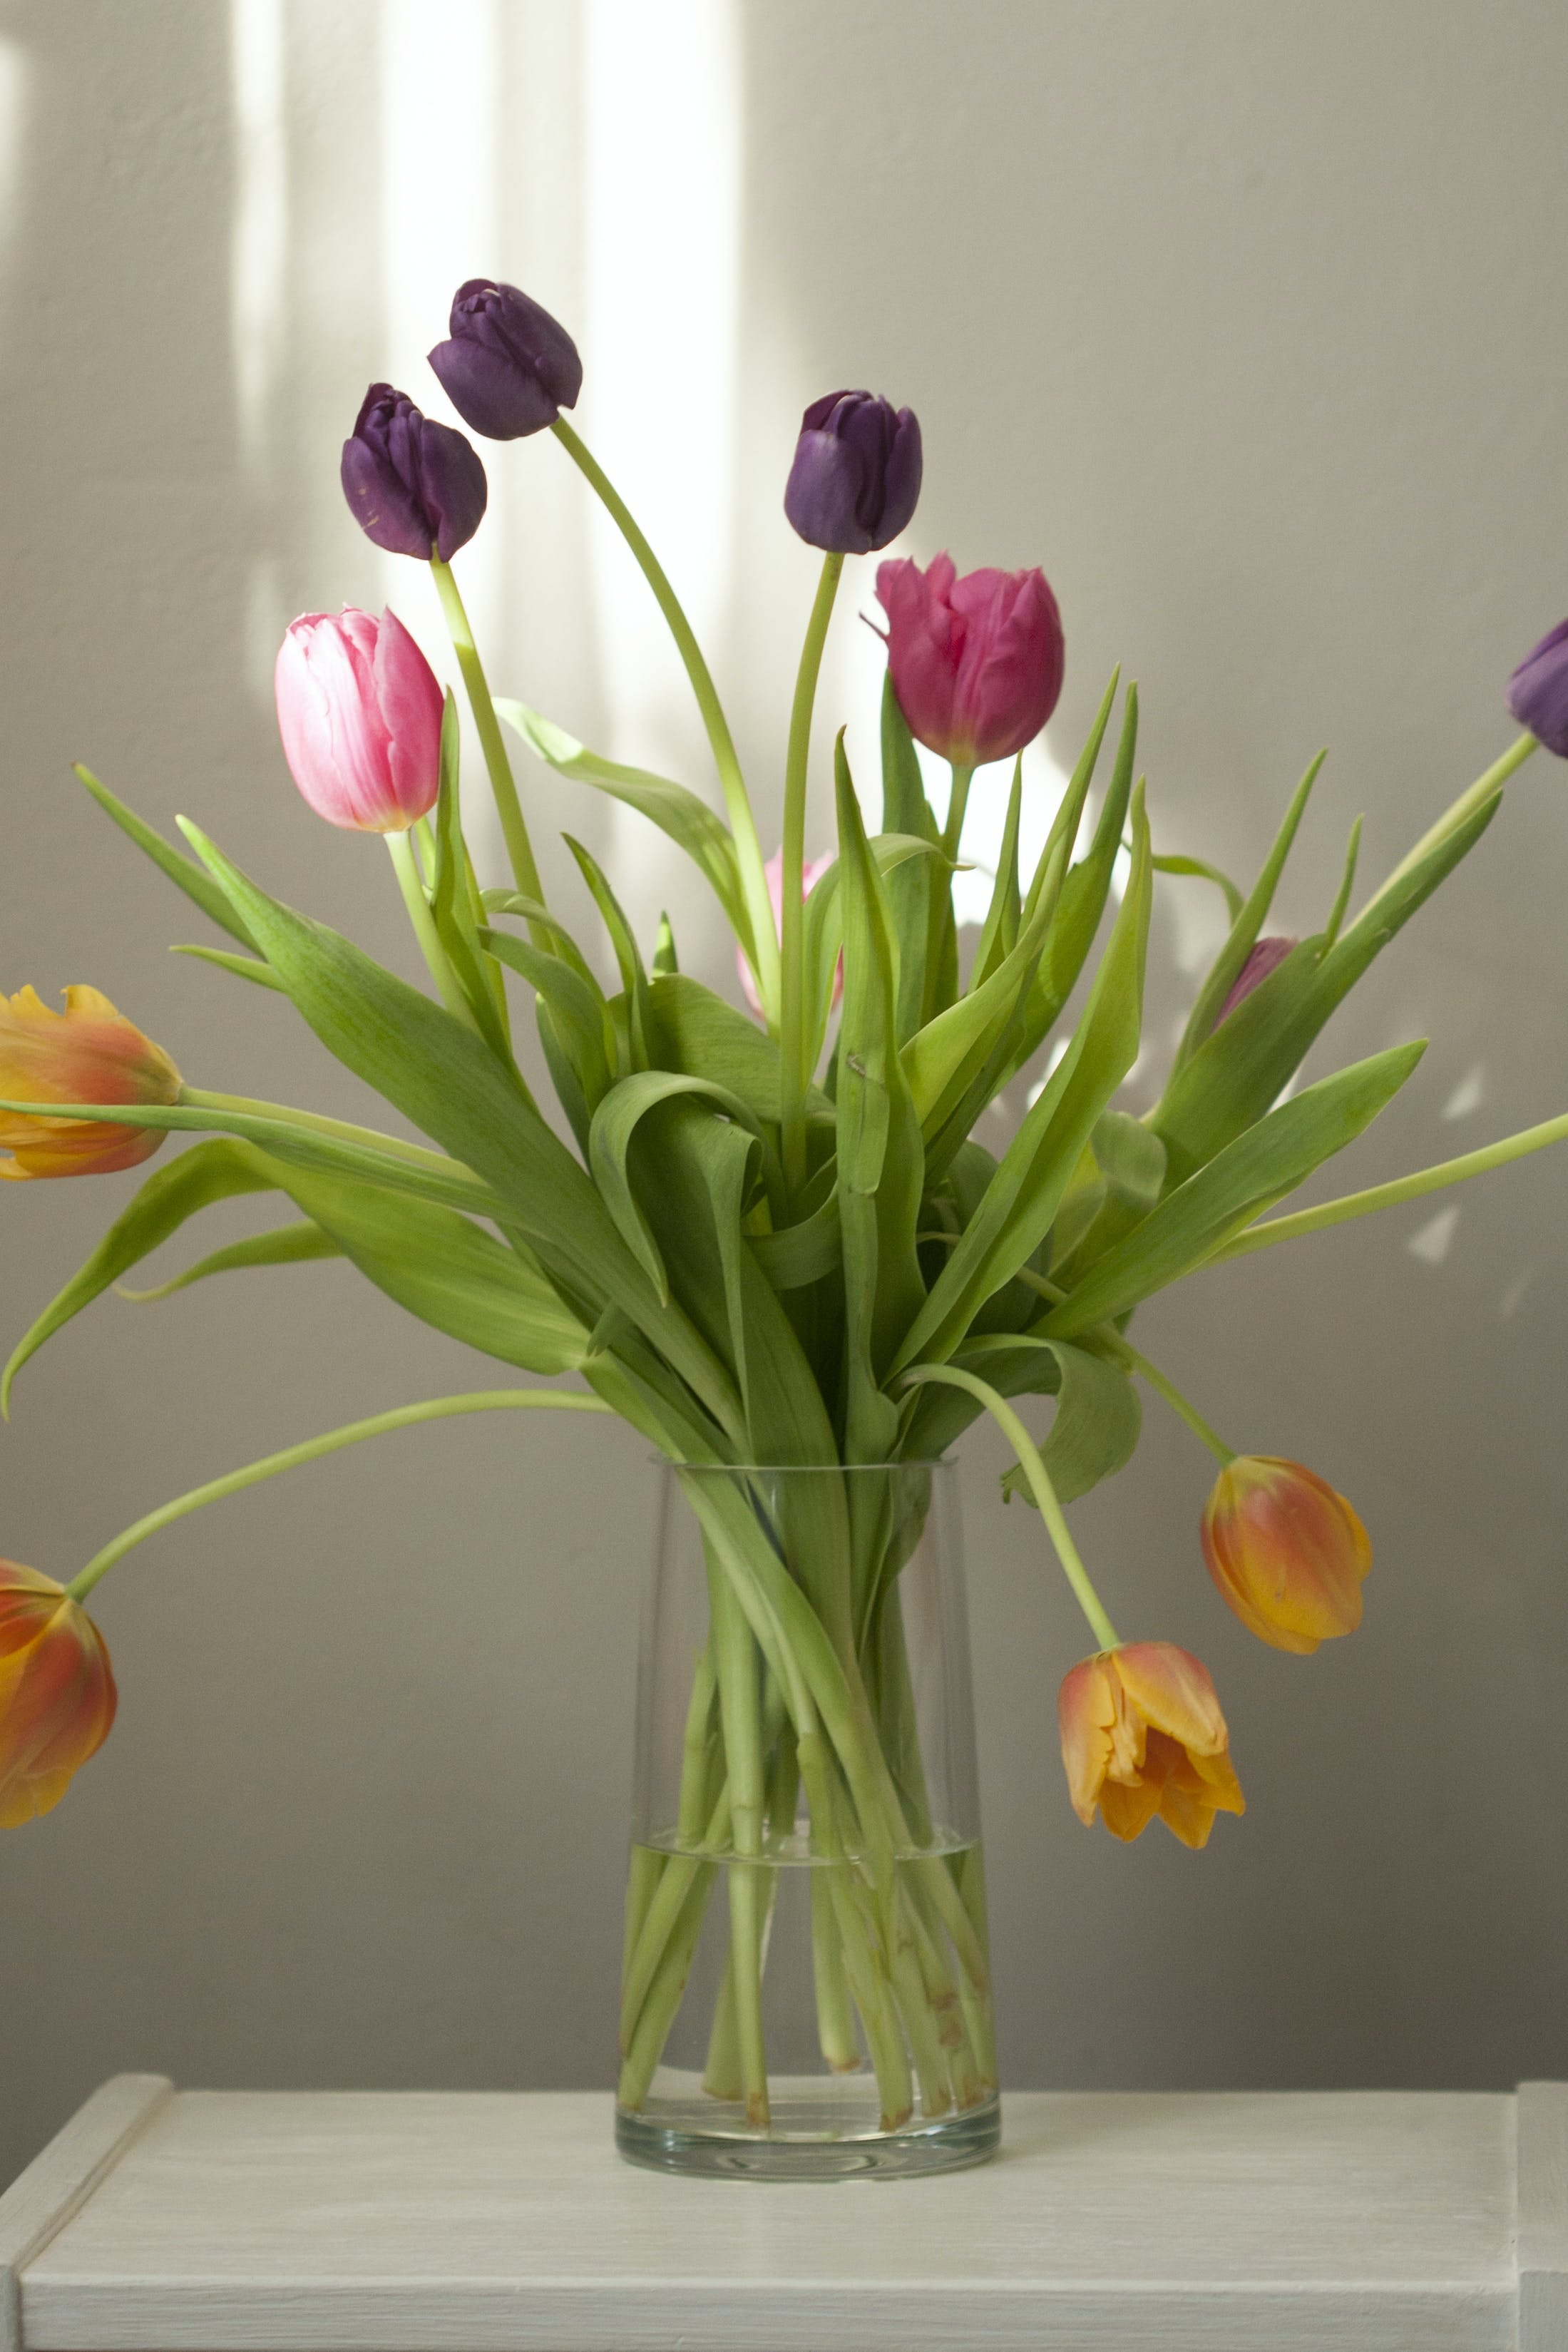 Free stock photo of arrangement, bloom, blossom, bouquet